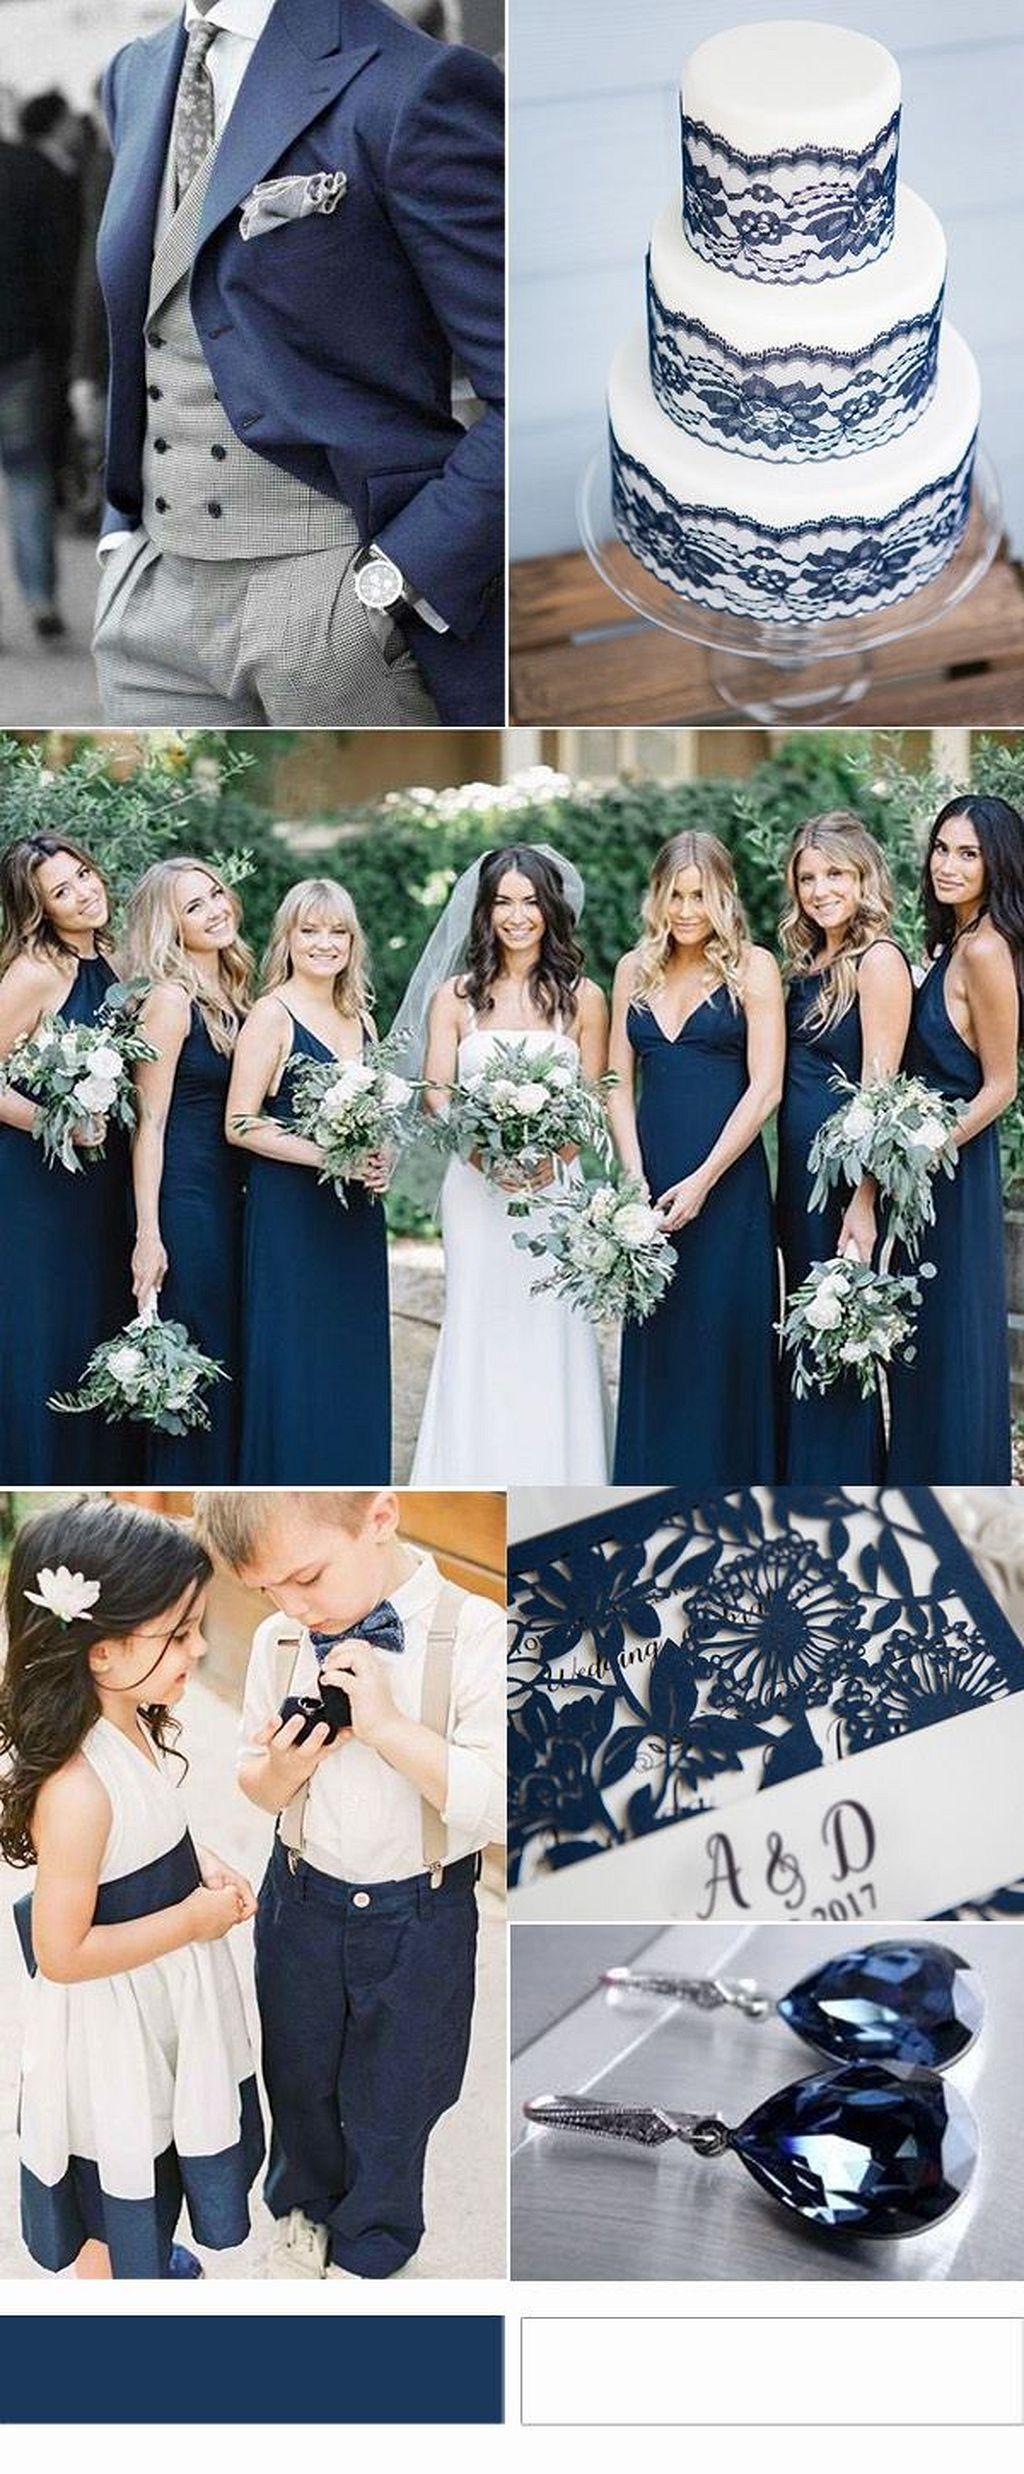 Pin by Miakoda Dreams on wedding in 2019  Wedding Wedding bridesmaids Navy blue wedding theme